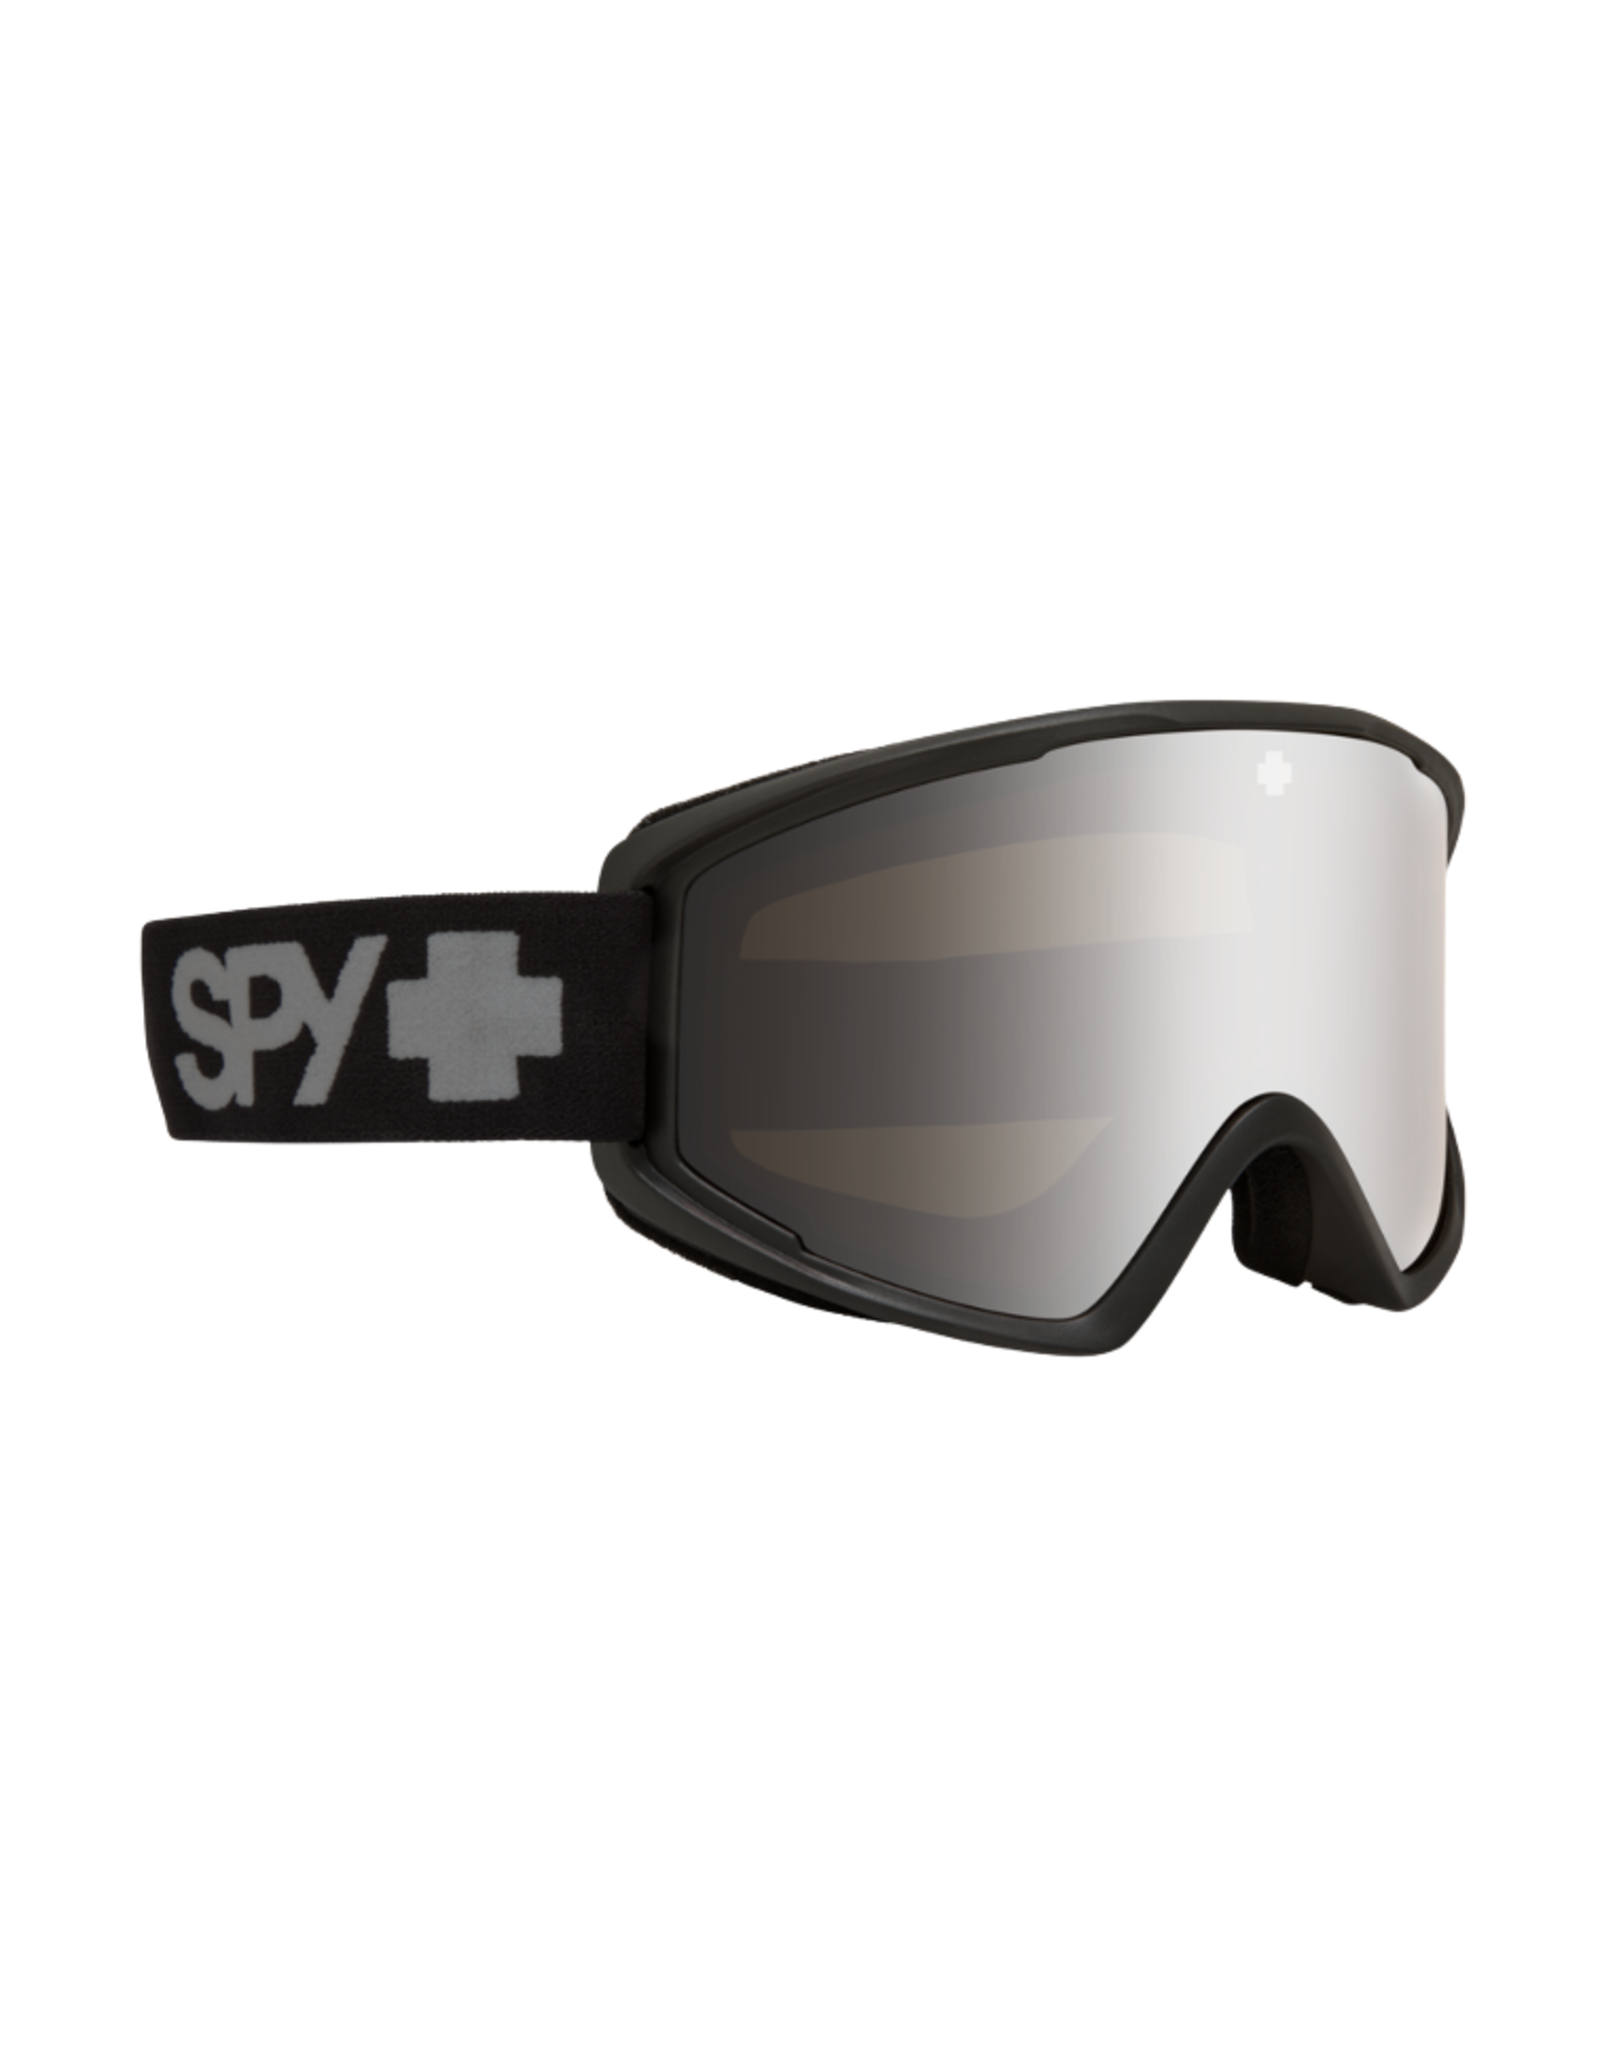 Spy Spy CRUSHER ELITE C/O Matte Black - HD Bronze w/ Silver Spectra Mirror